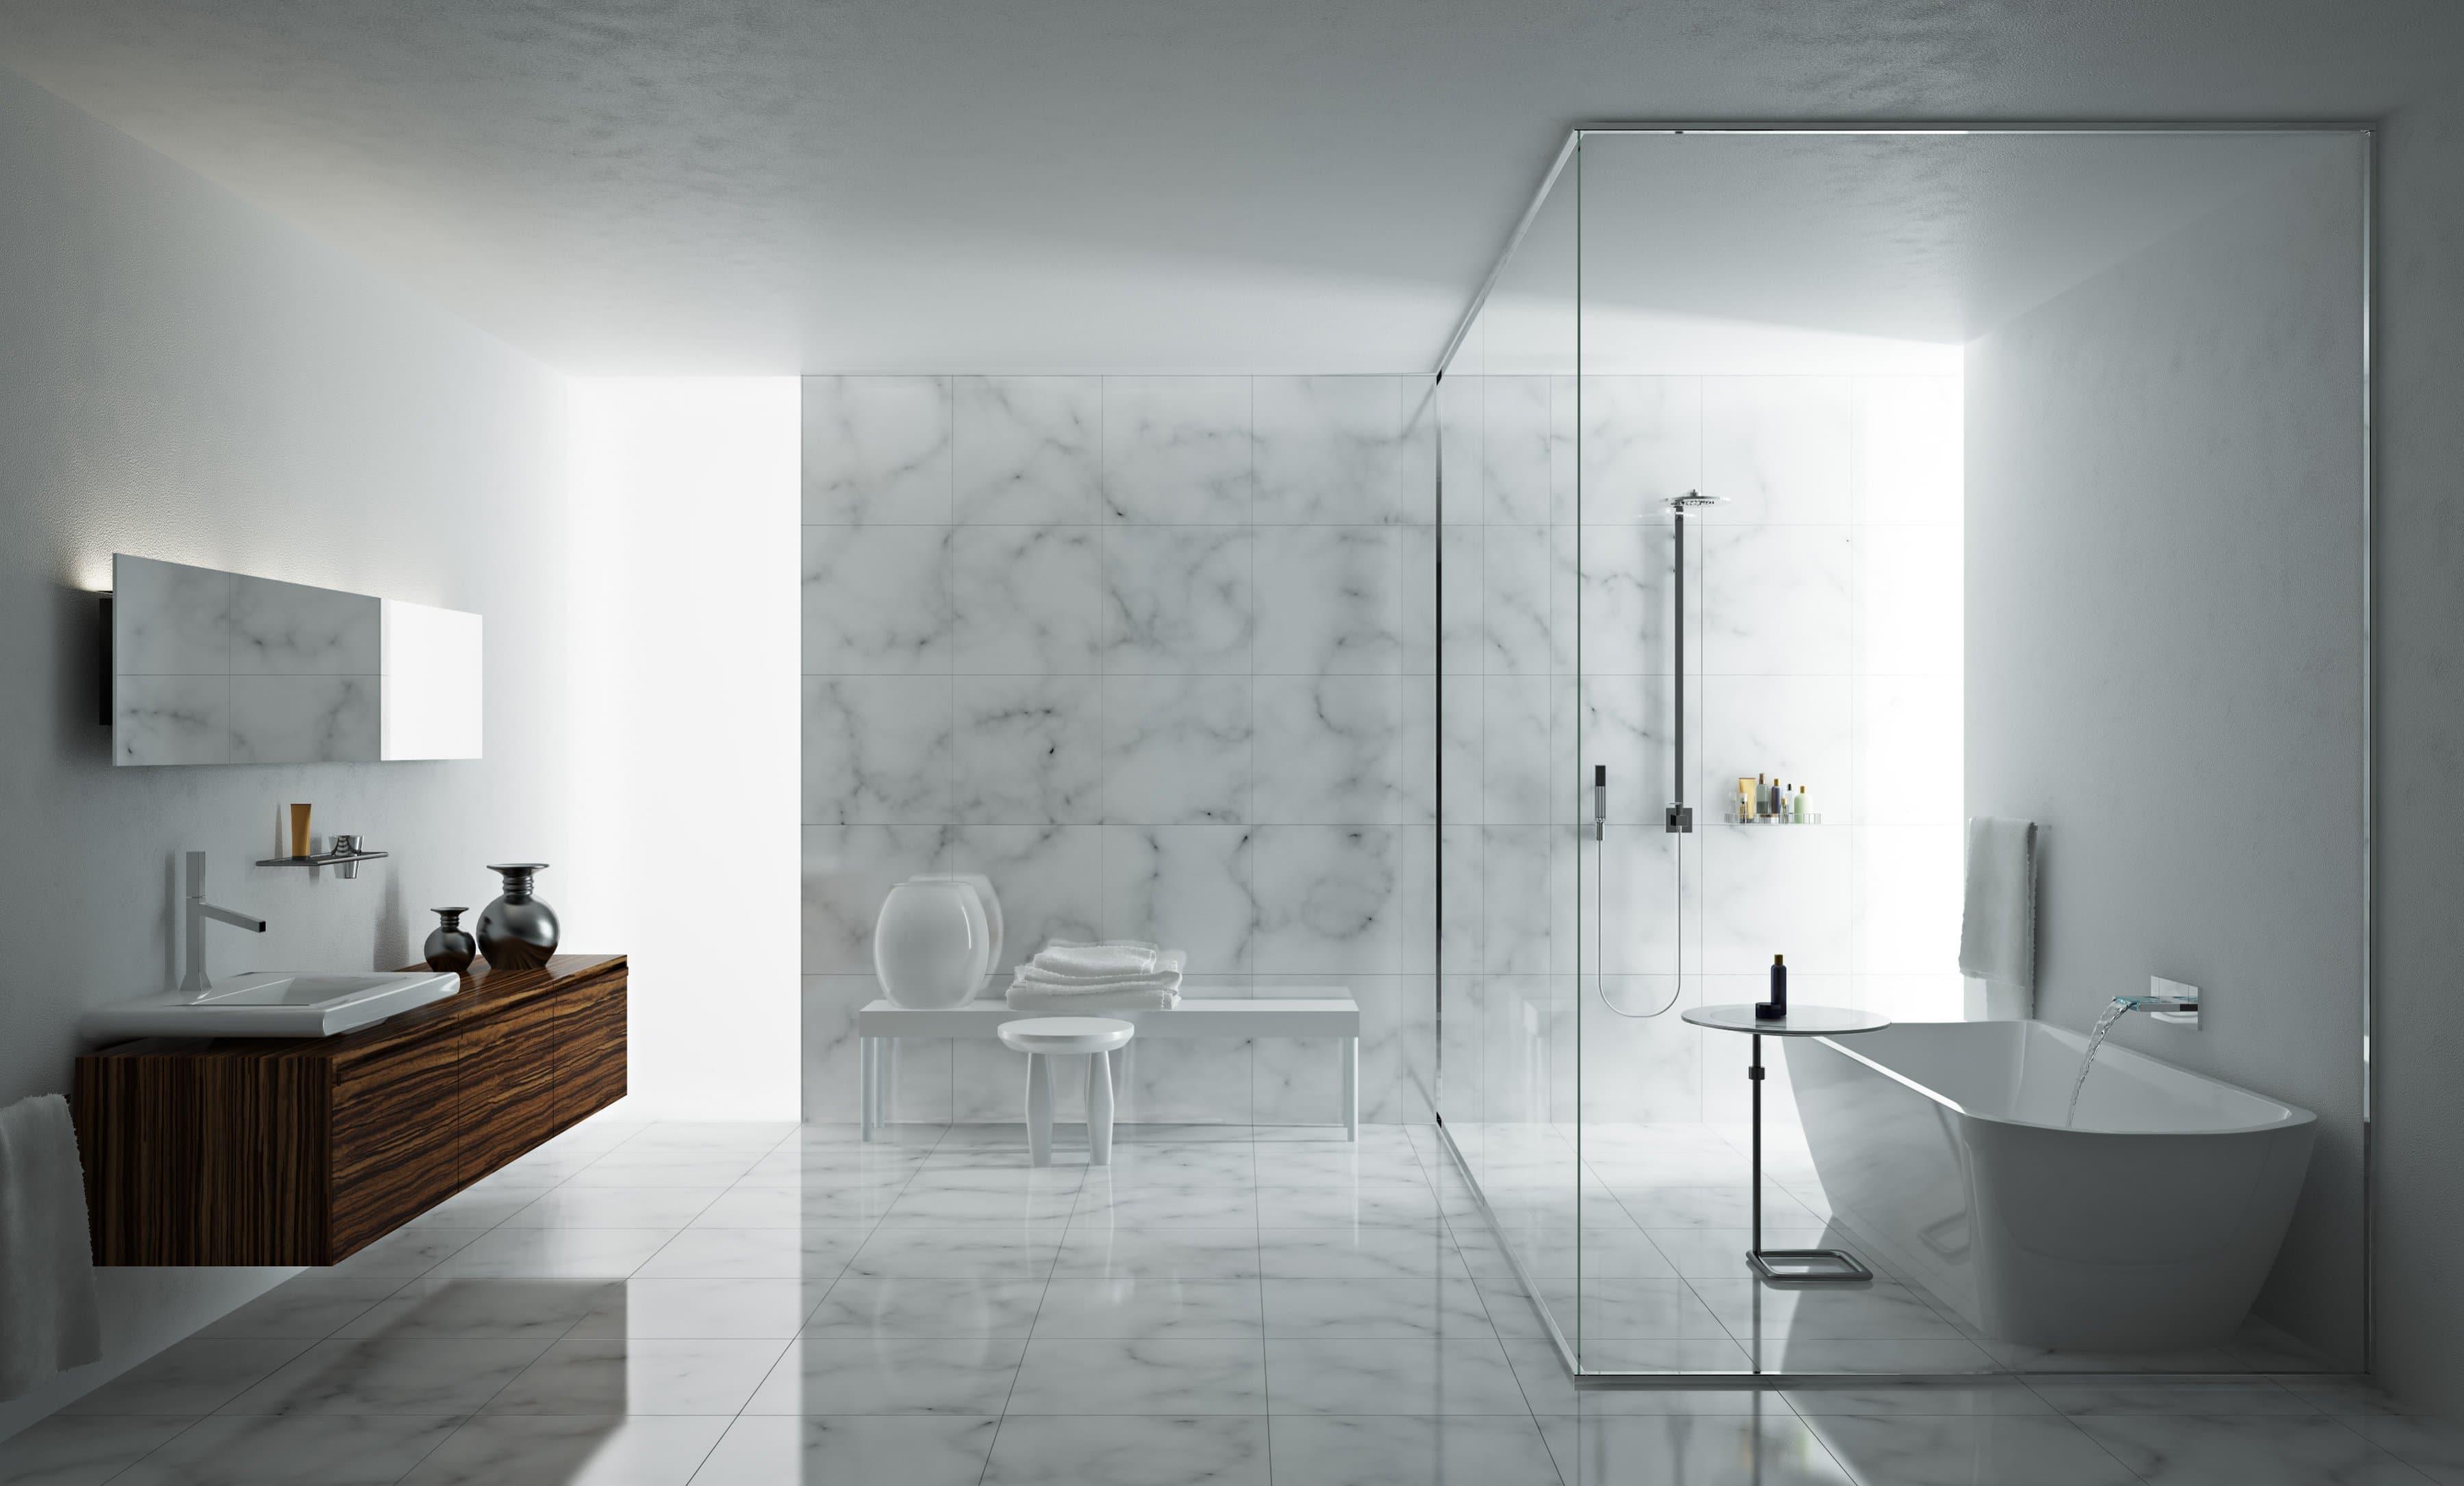 Source : http://valiet.org/addfa9ead29cb931-bathroom-designs-with-showers.html